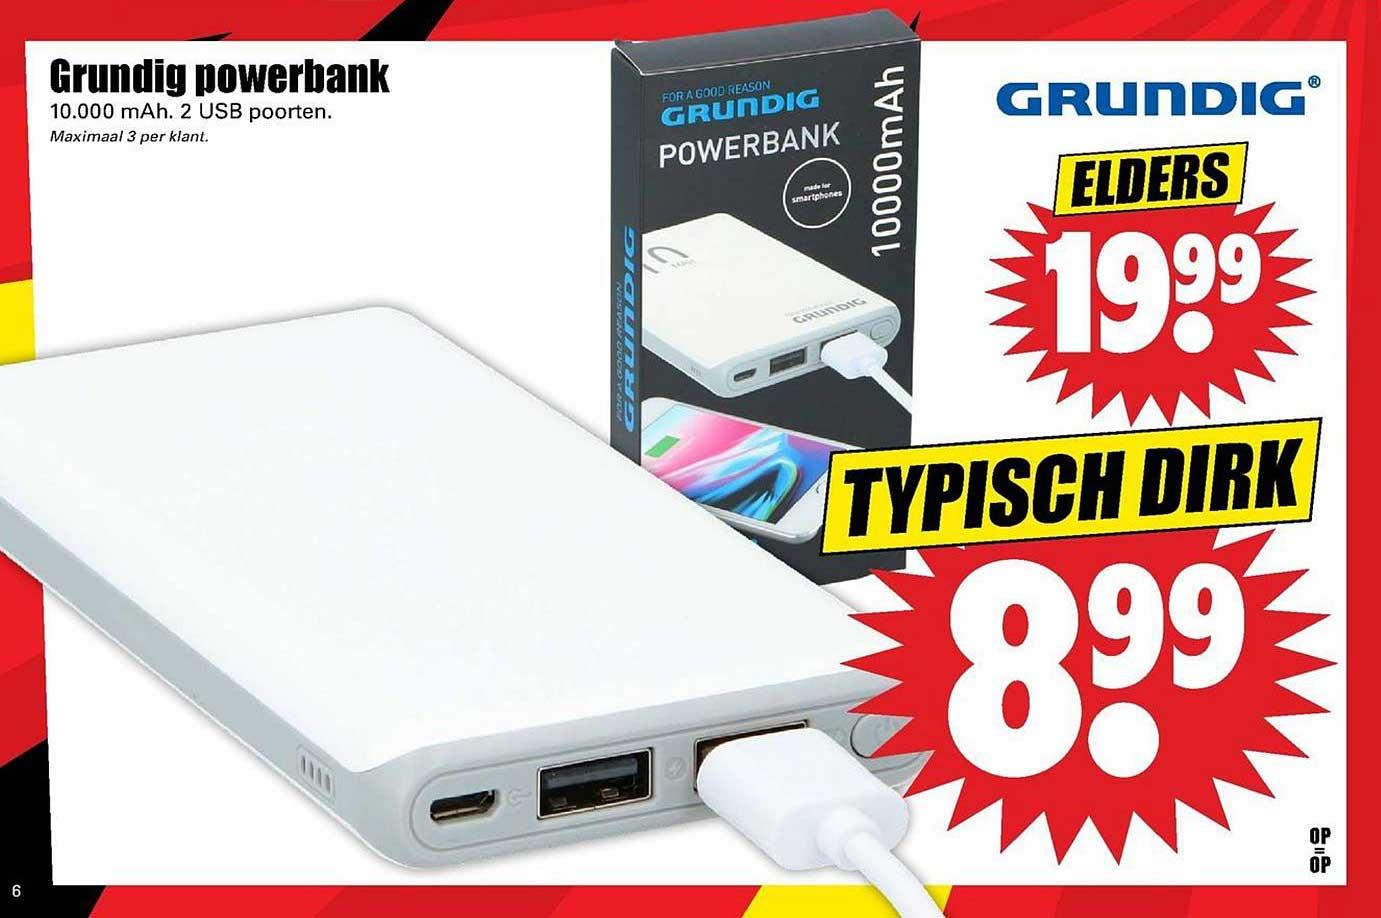 Dirk Grundig Powerbank